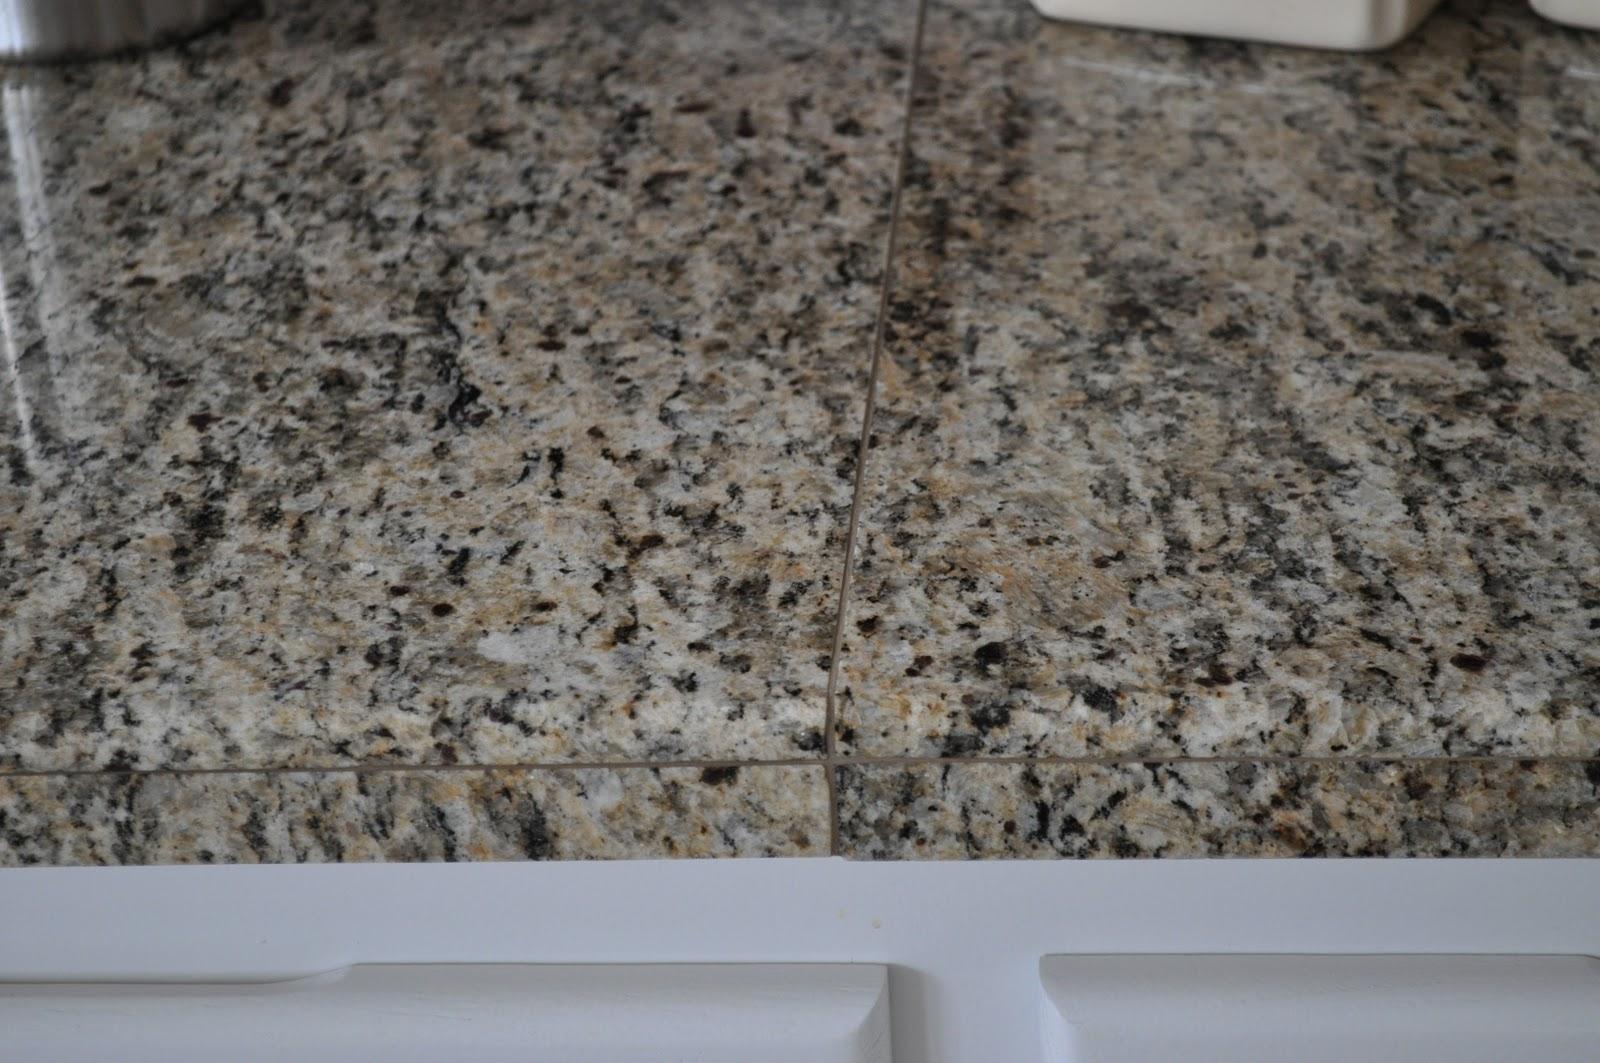 it kits yourself countertop refinishing granite corekit countertops bathroom armor kitchen garage tile do